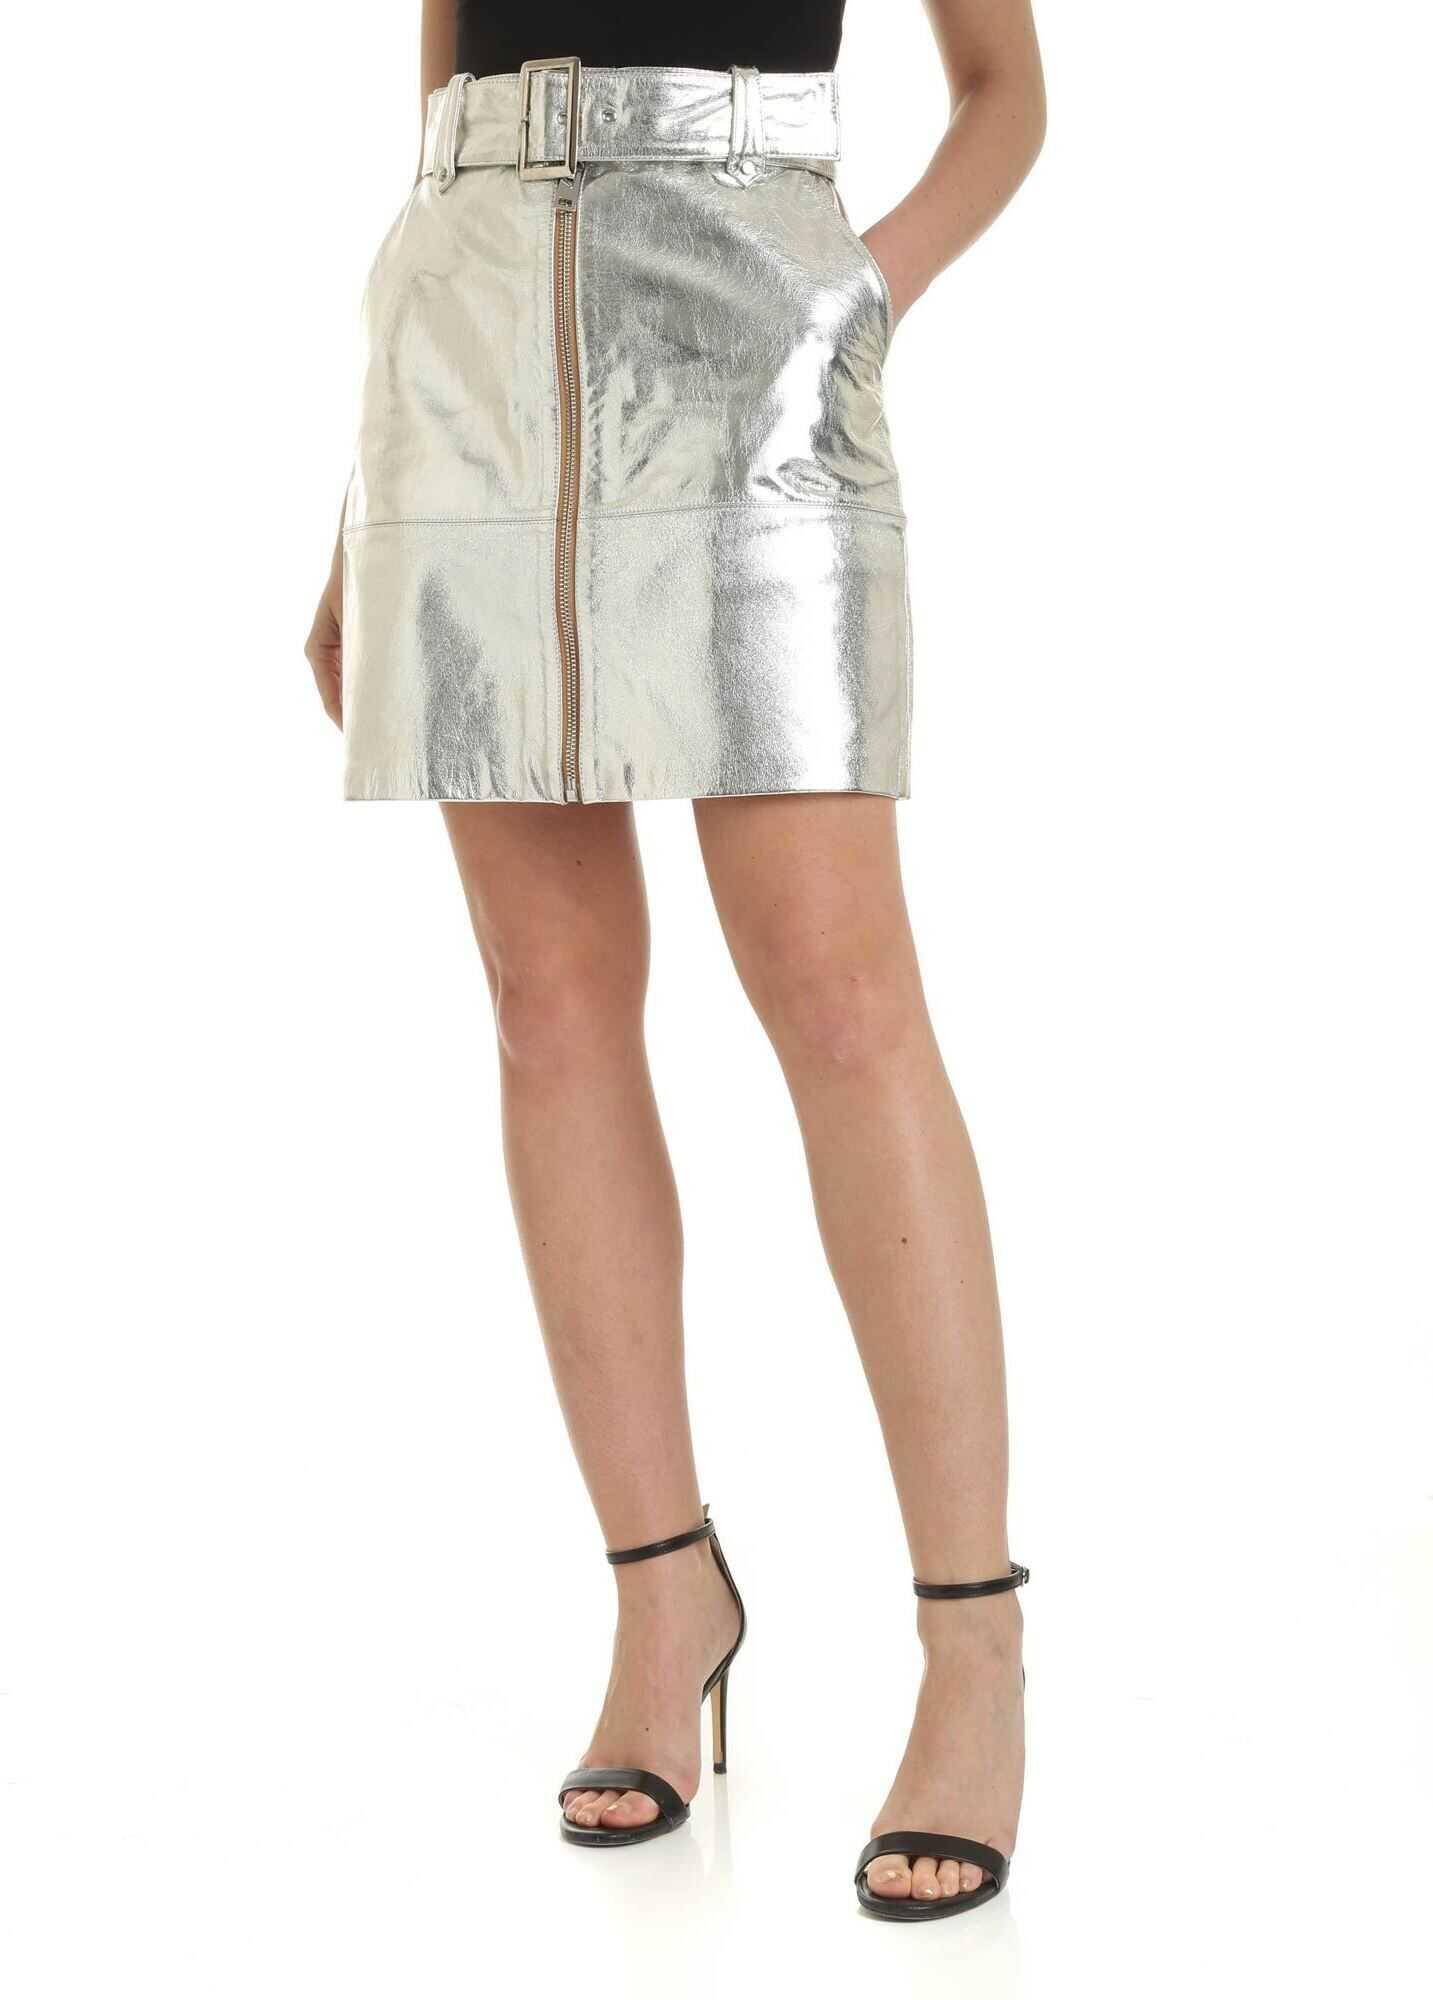 Torta Short Skirt In Silver Color thumbnail